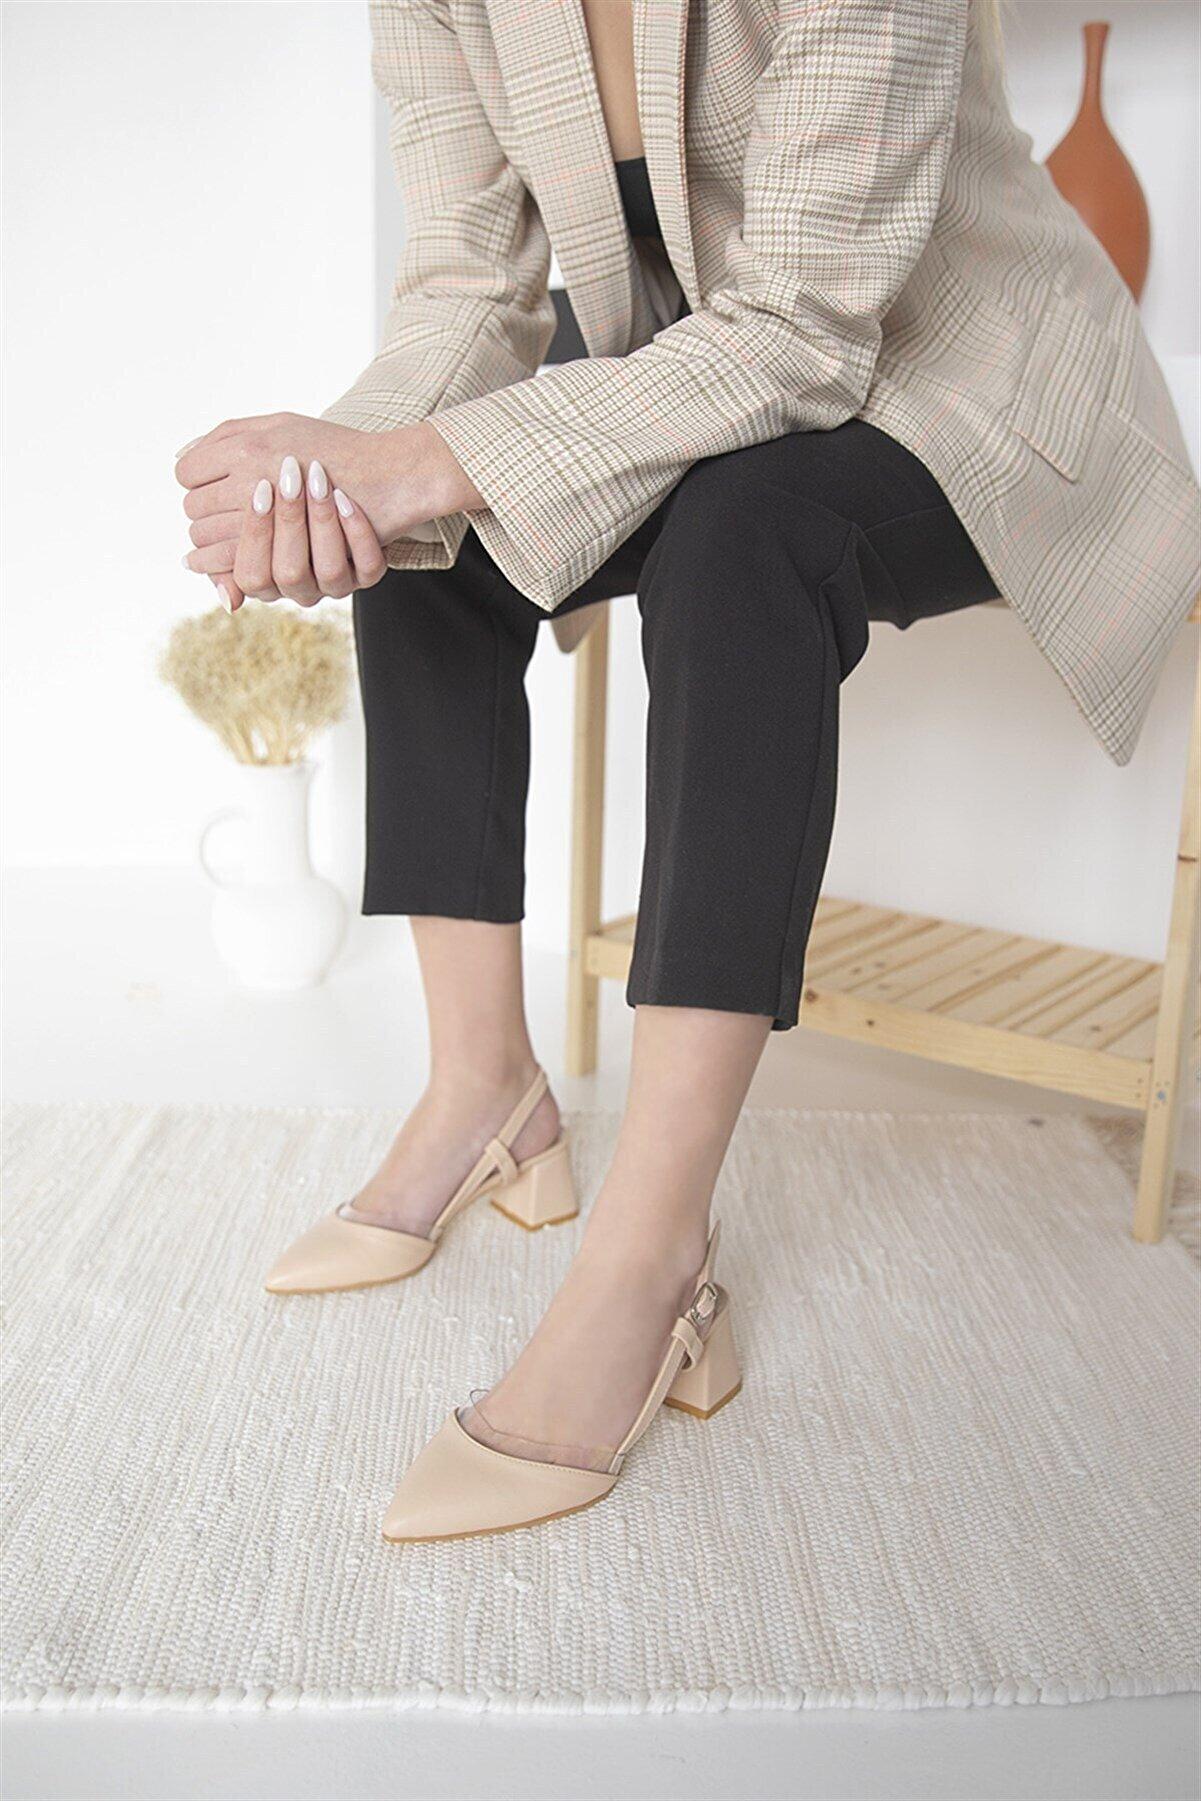 Straswans Roy Bayan Deri Topuklu Ayakkabı Ten